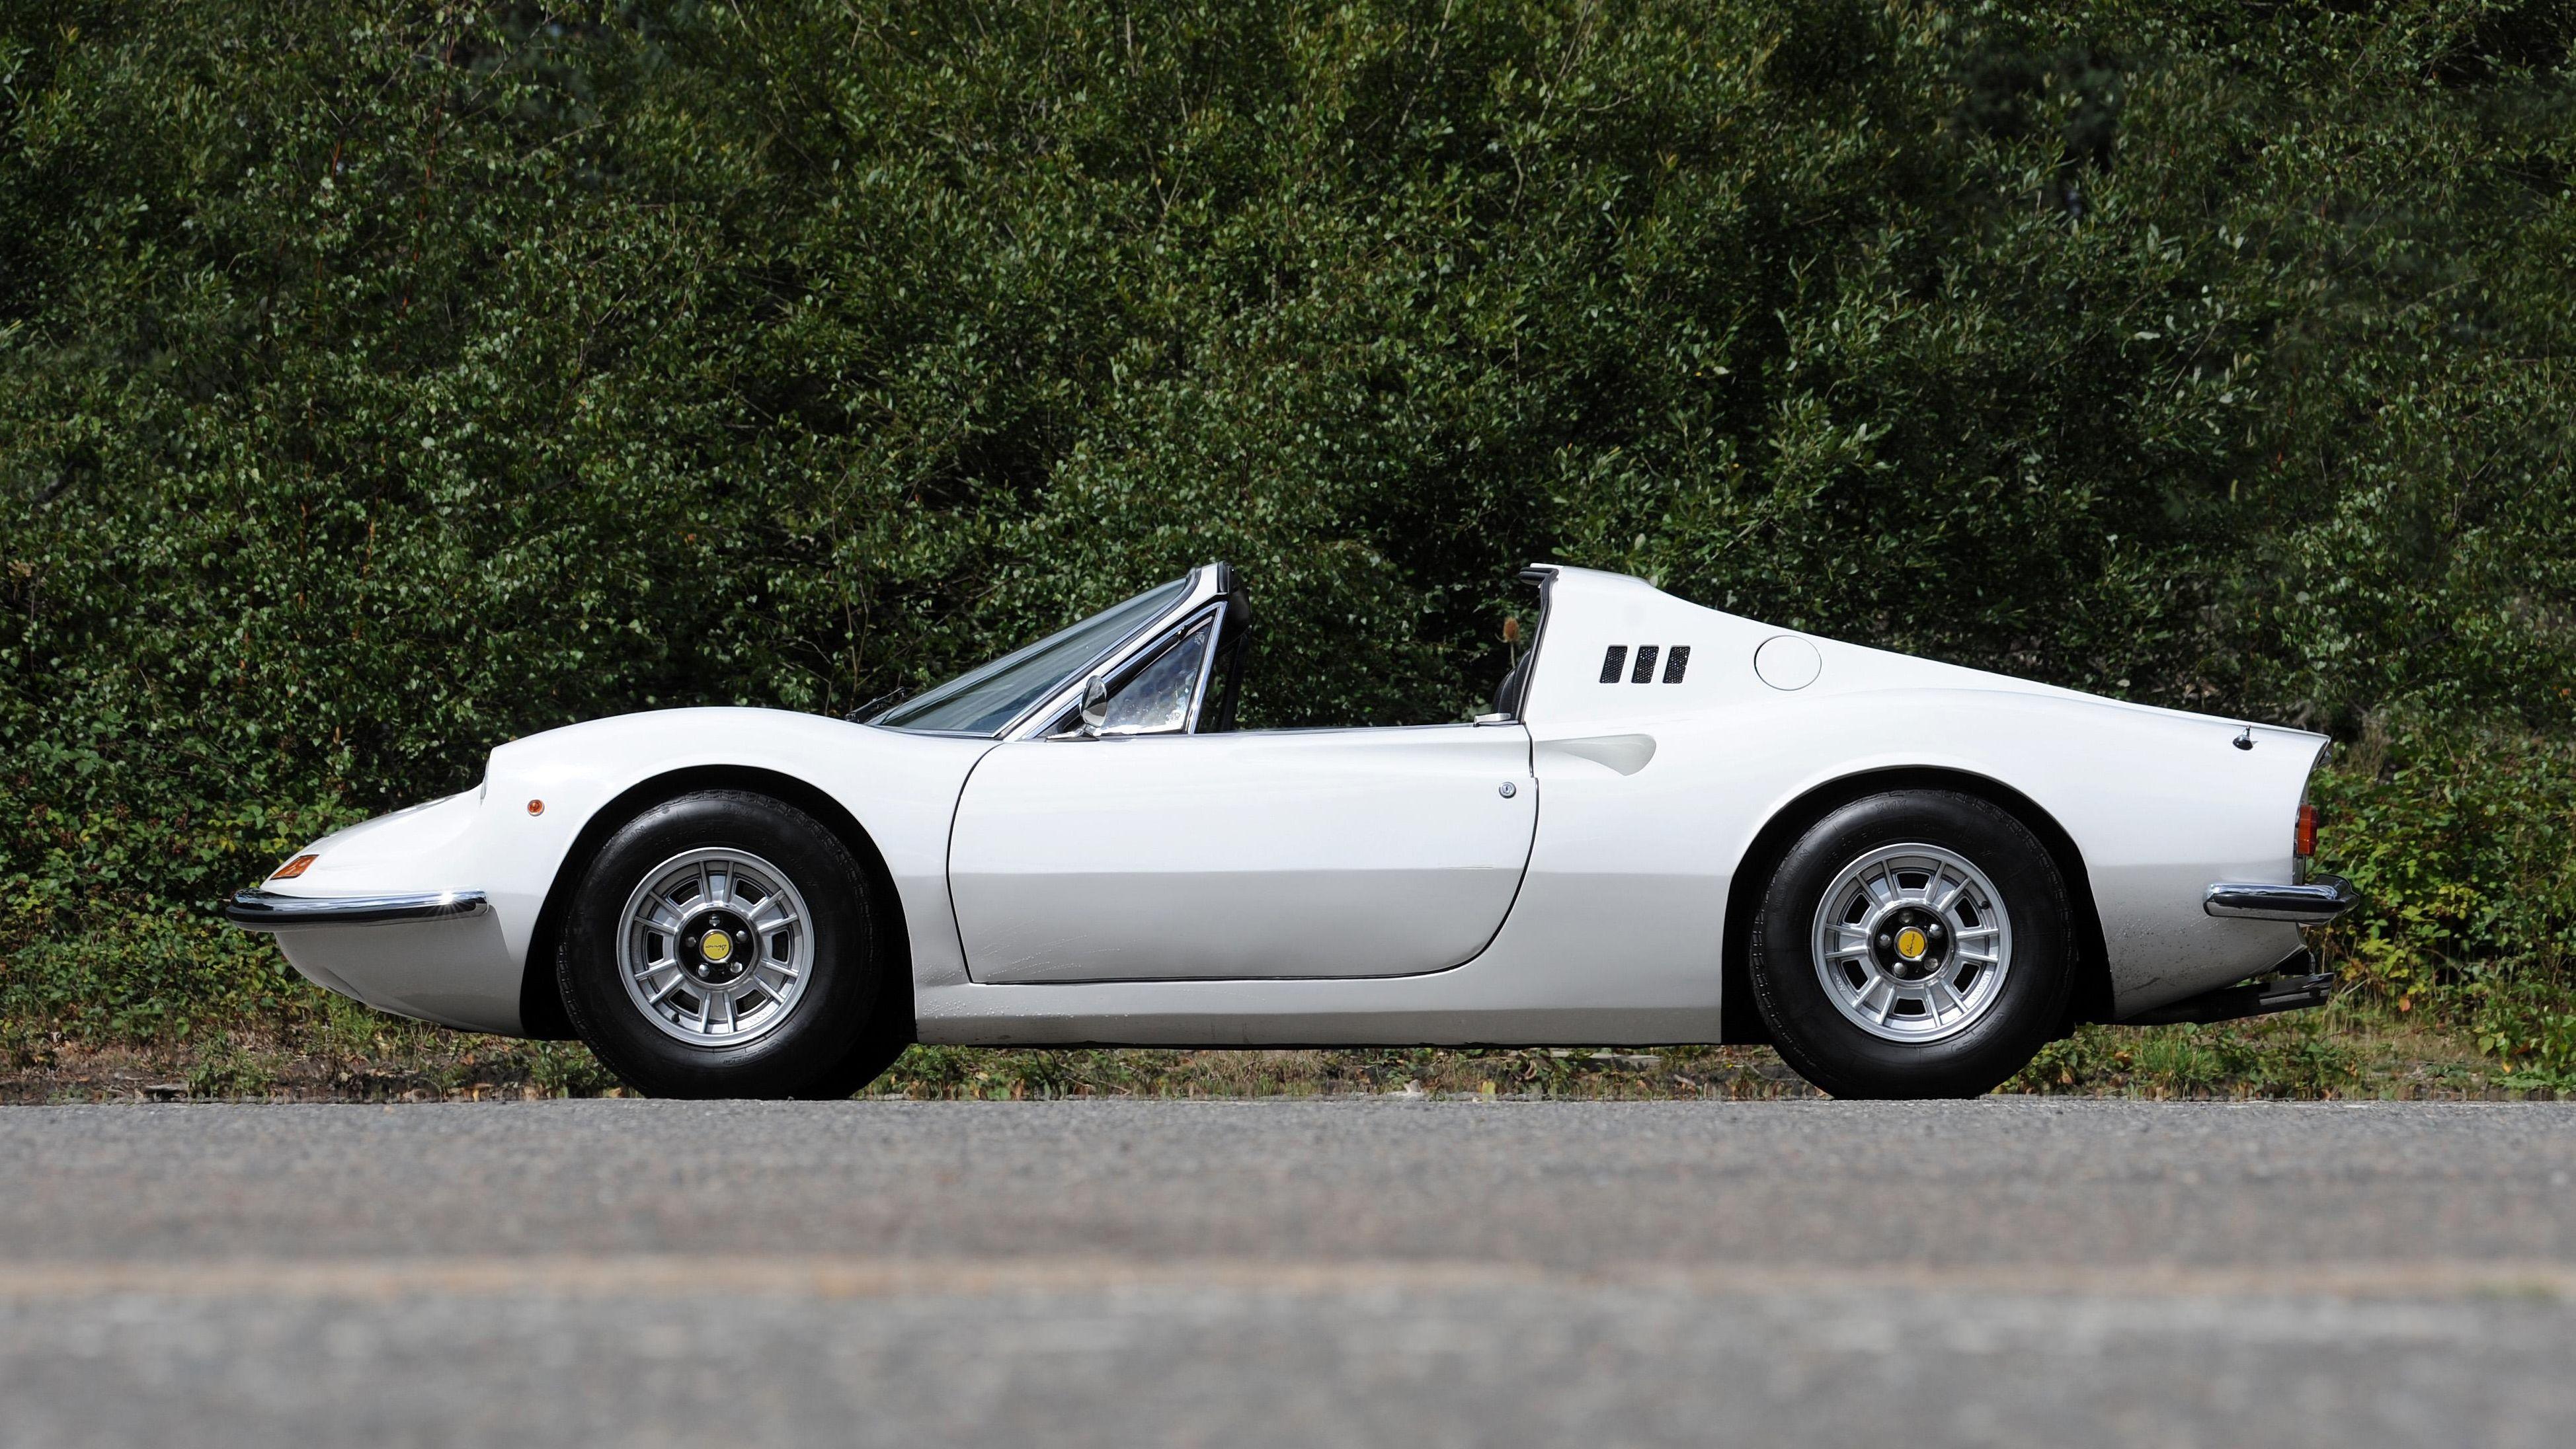 7f464facbfc2a034a31e6648ff37a91a Marvelous Ferrari Mondial 8 Te Koop Cars Trend